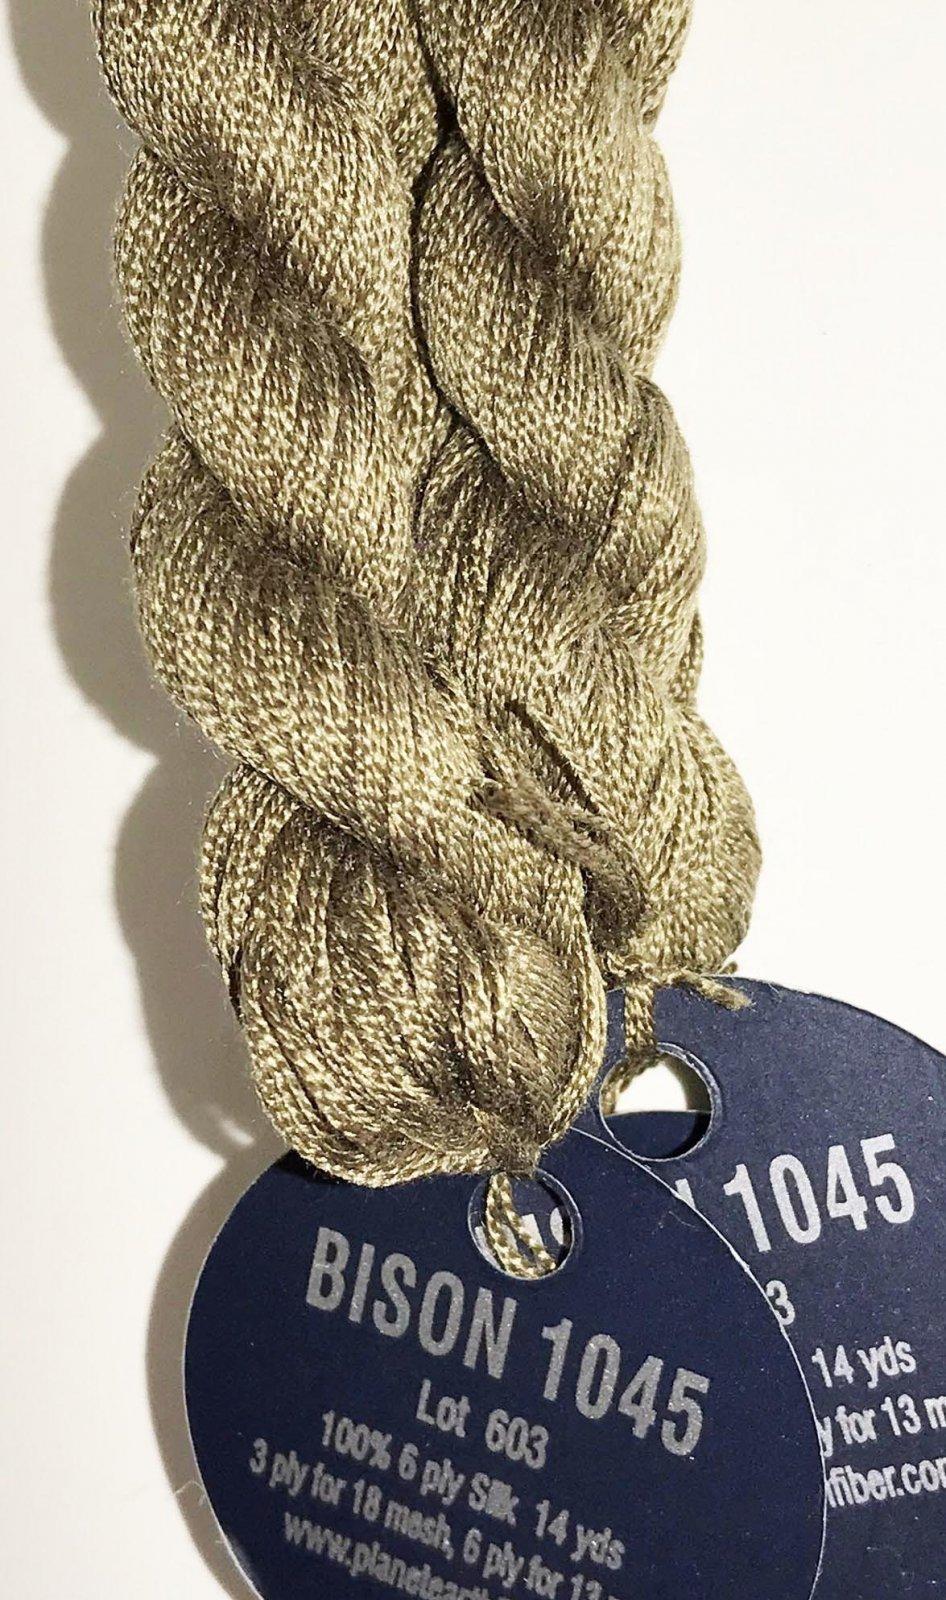 PE6-BISON-1045